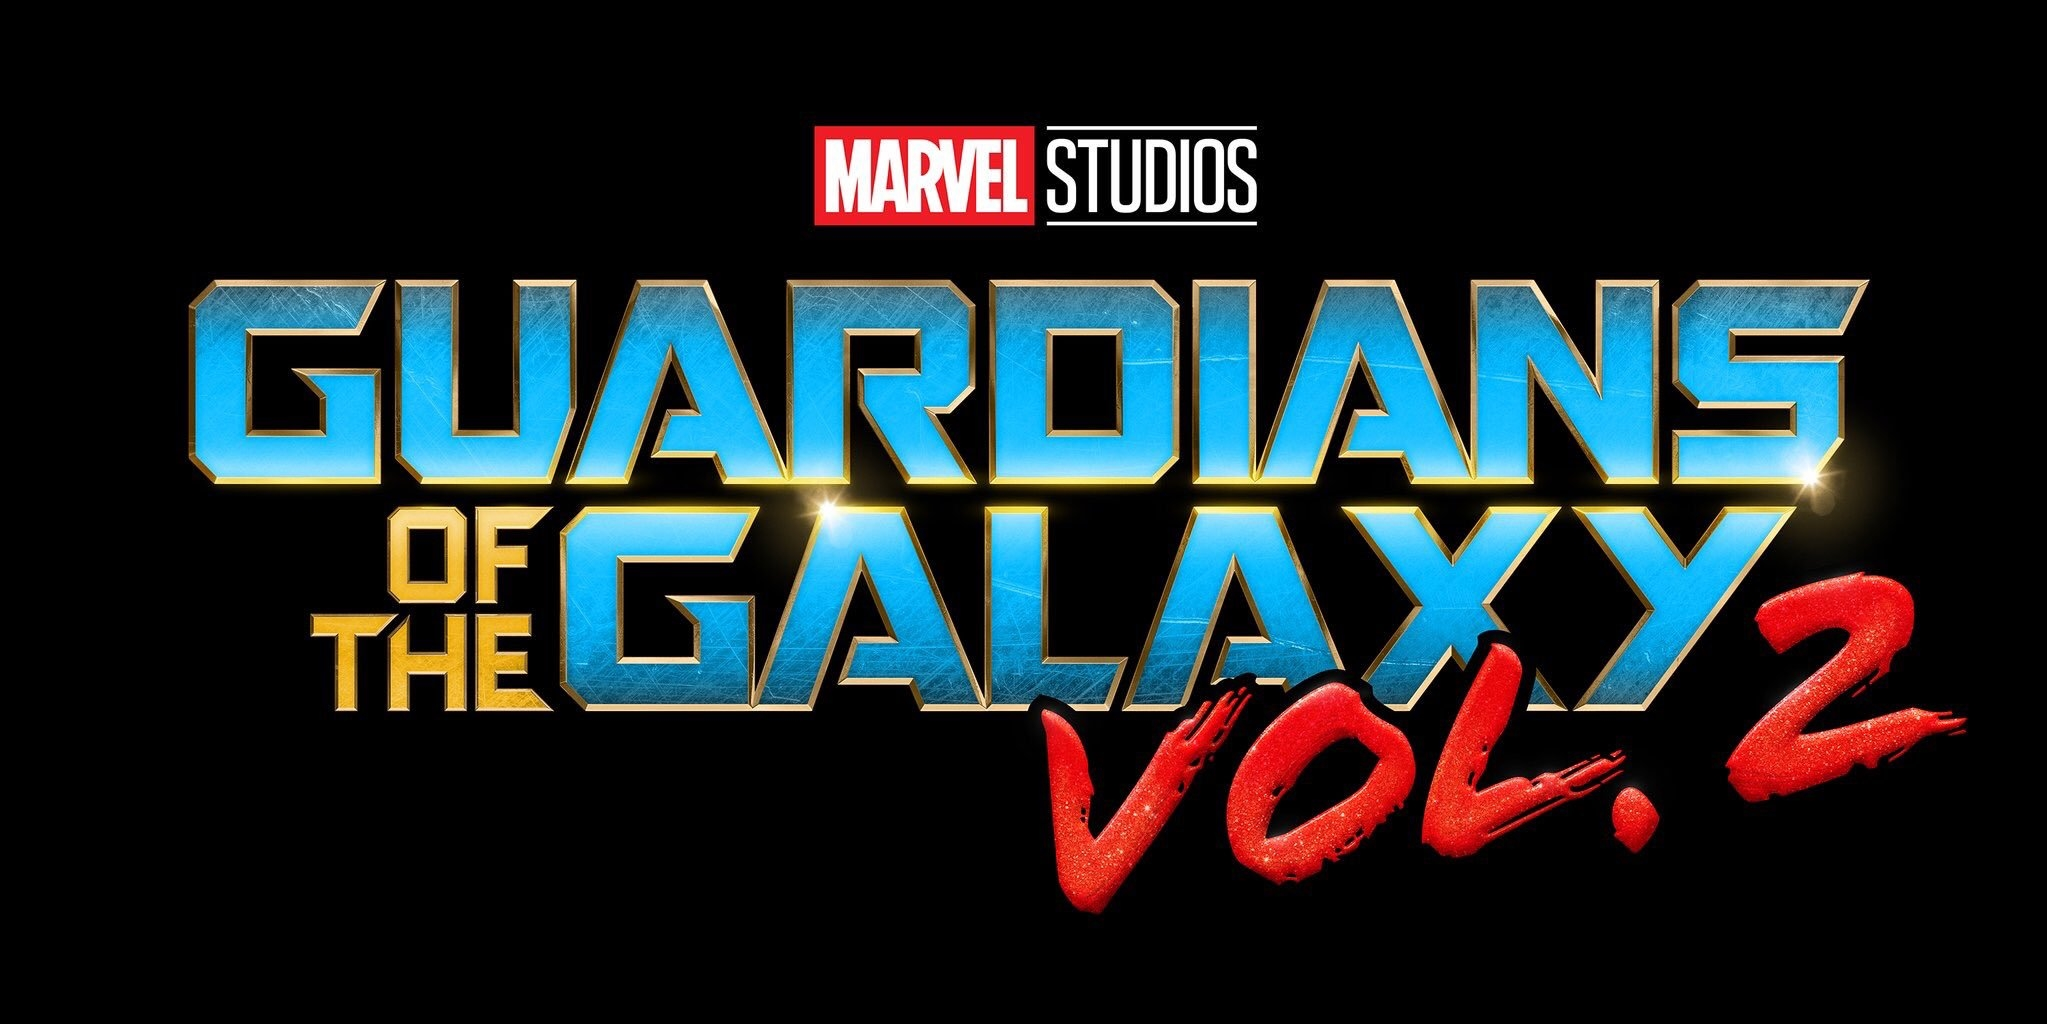 Guardians Of The Galaxy Vol. 2 Spoilers Review Chris Pratt, Zoe Saldana, Dave Bautista, Kurt Russell